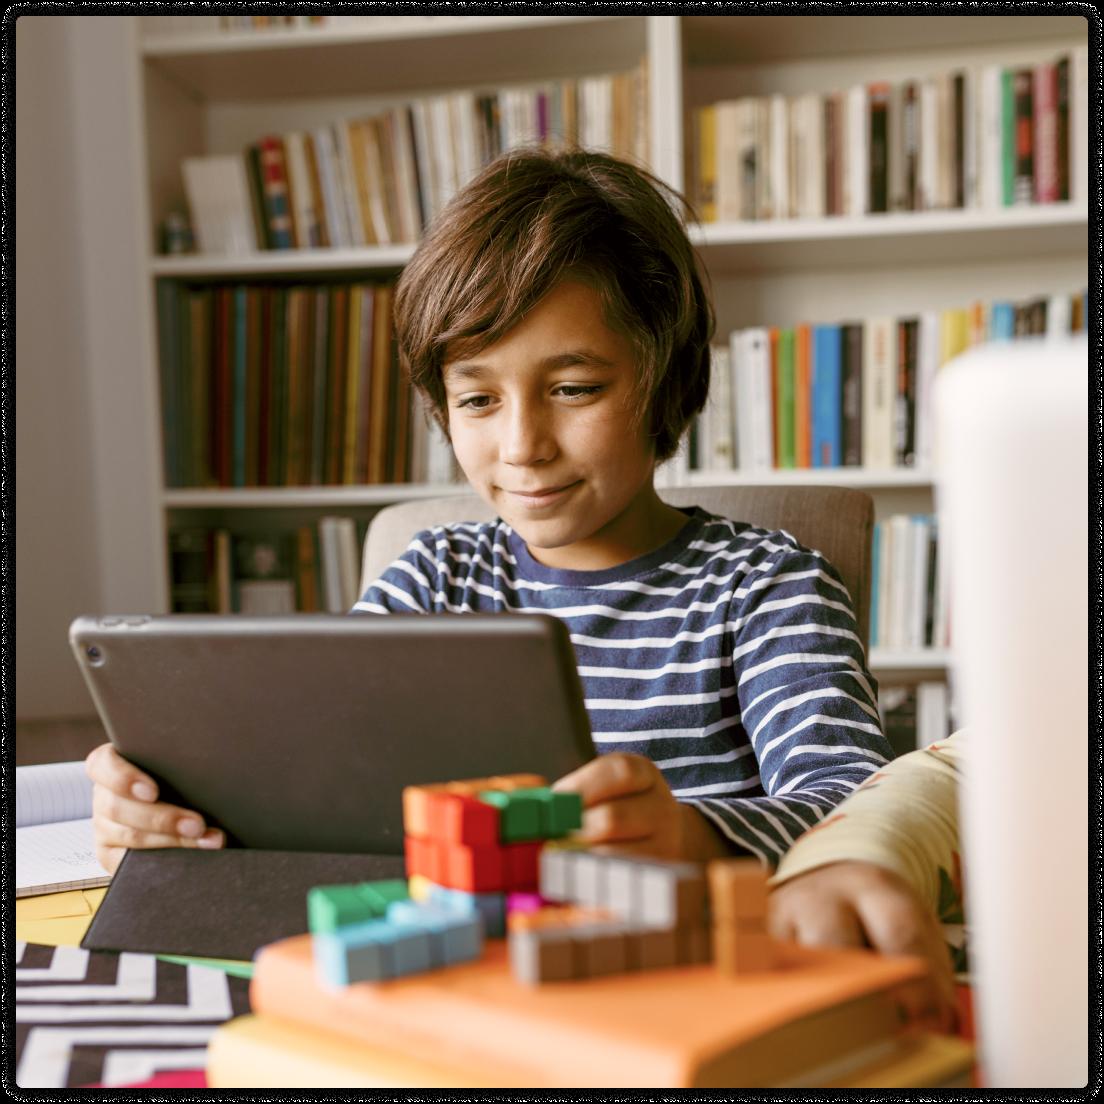 Boy on iPad - Tutoring